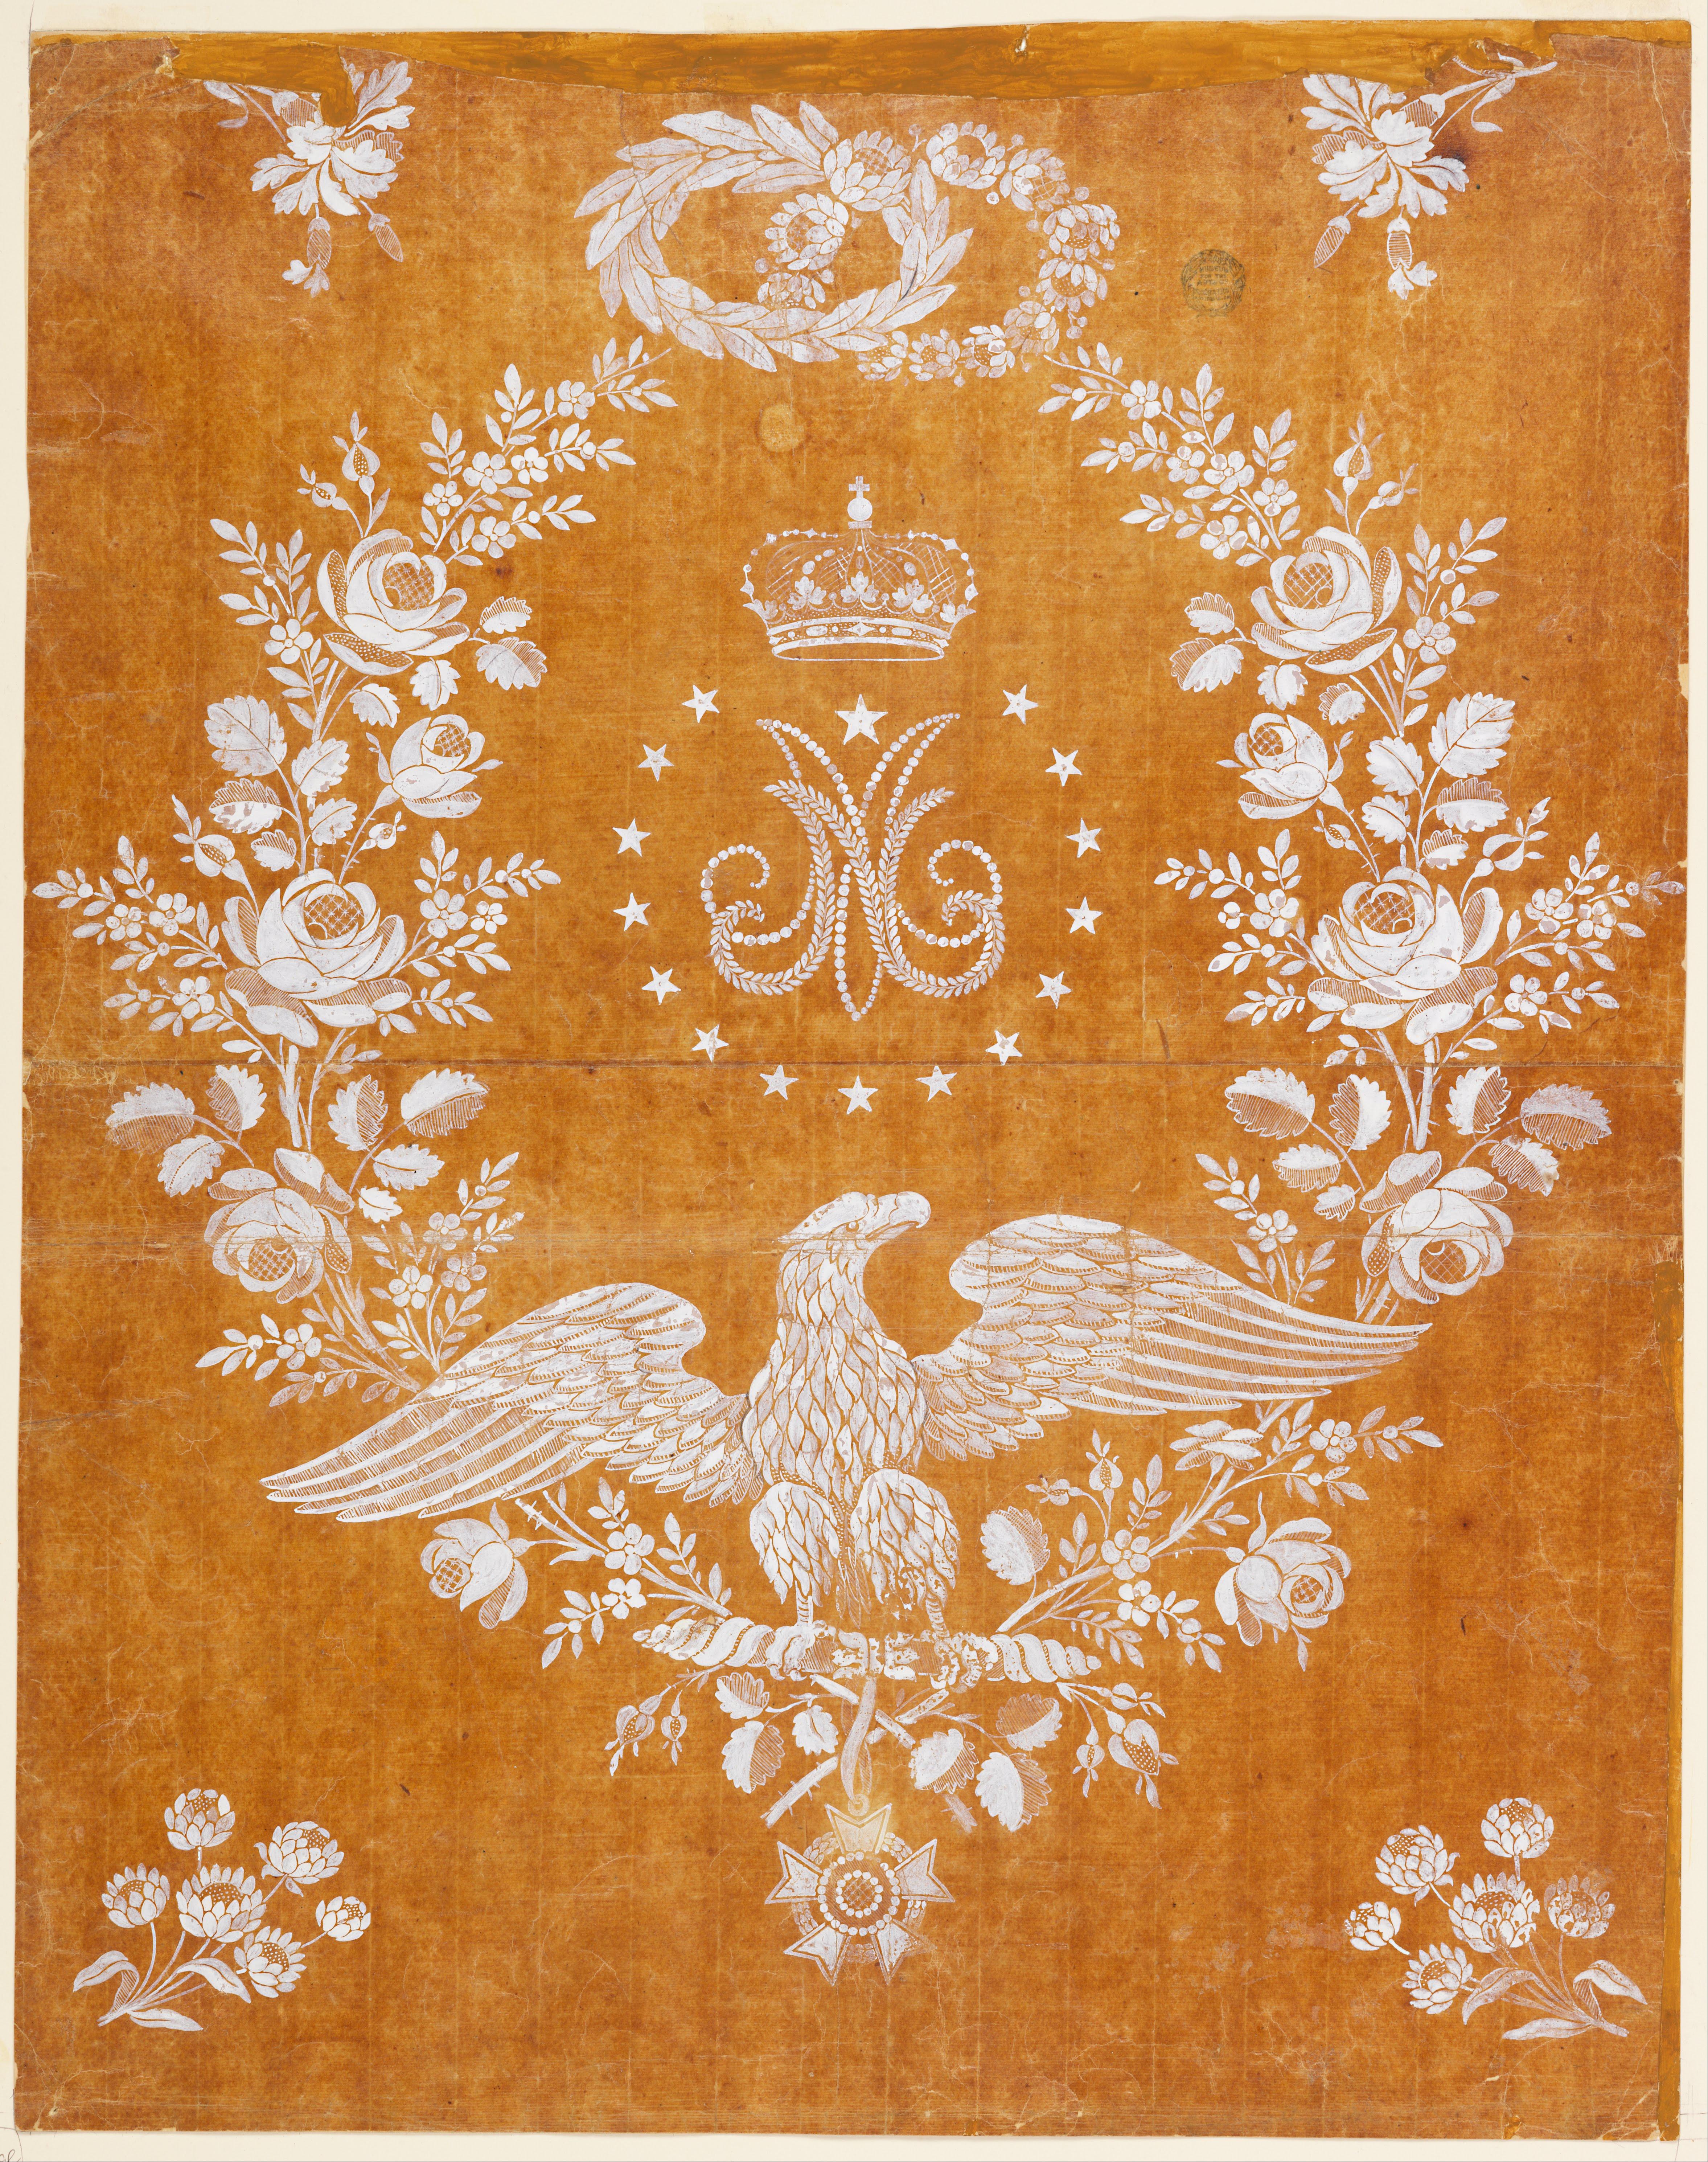 Embroidery Design Free Applique